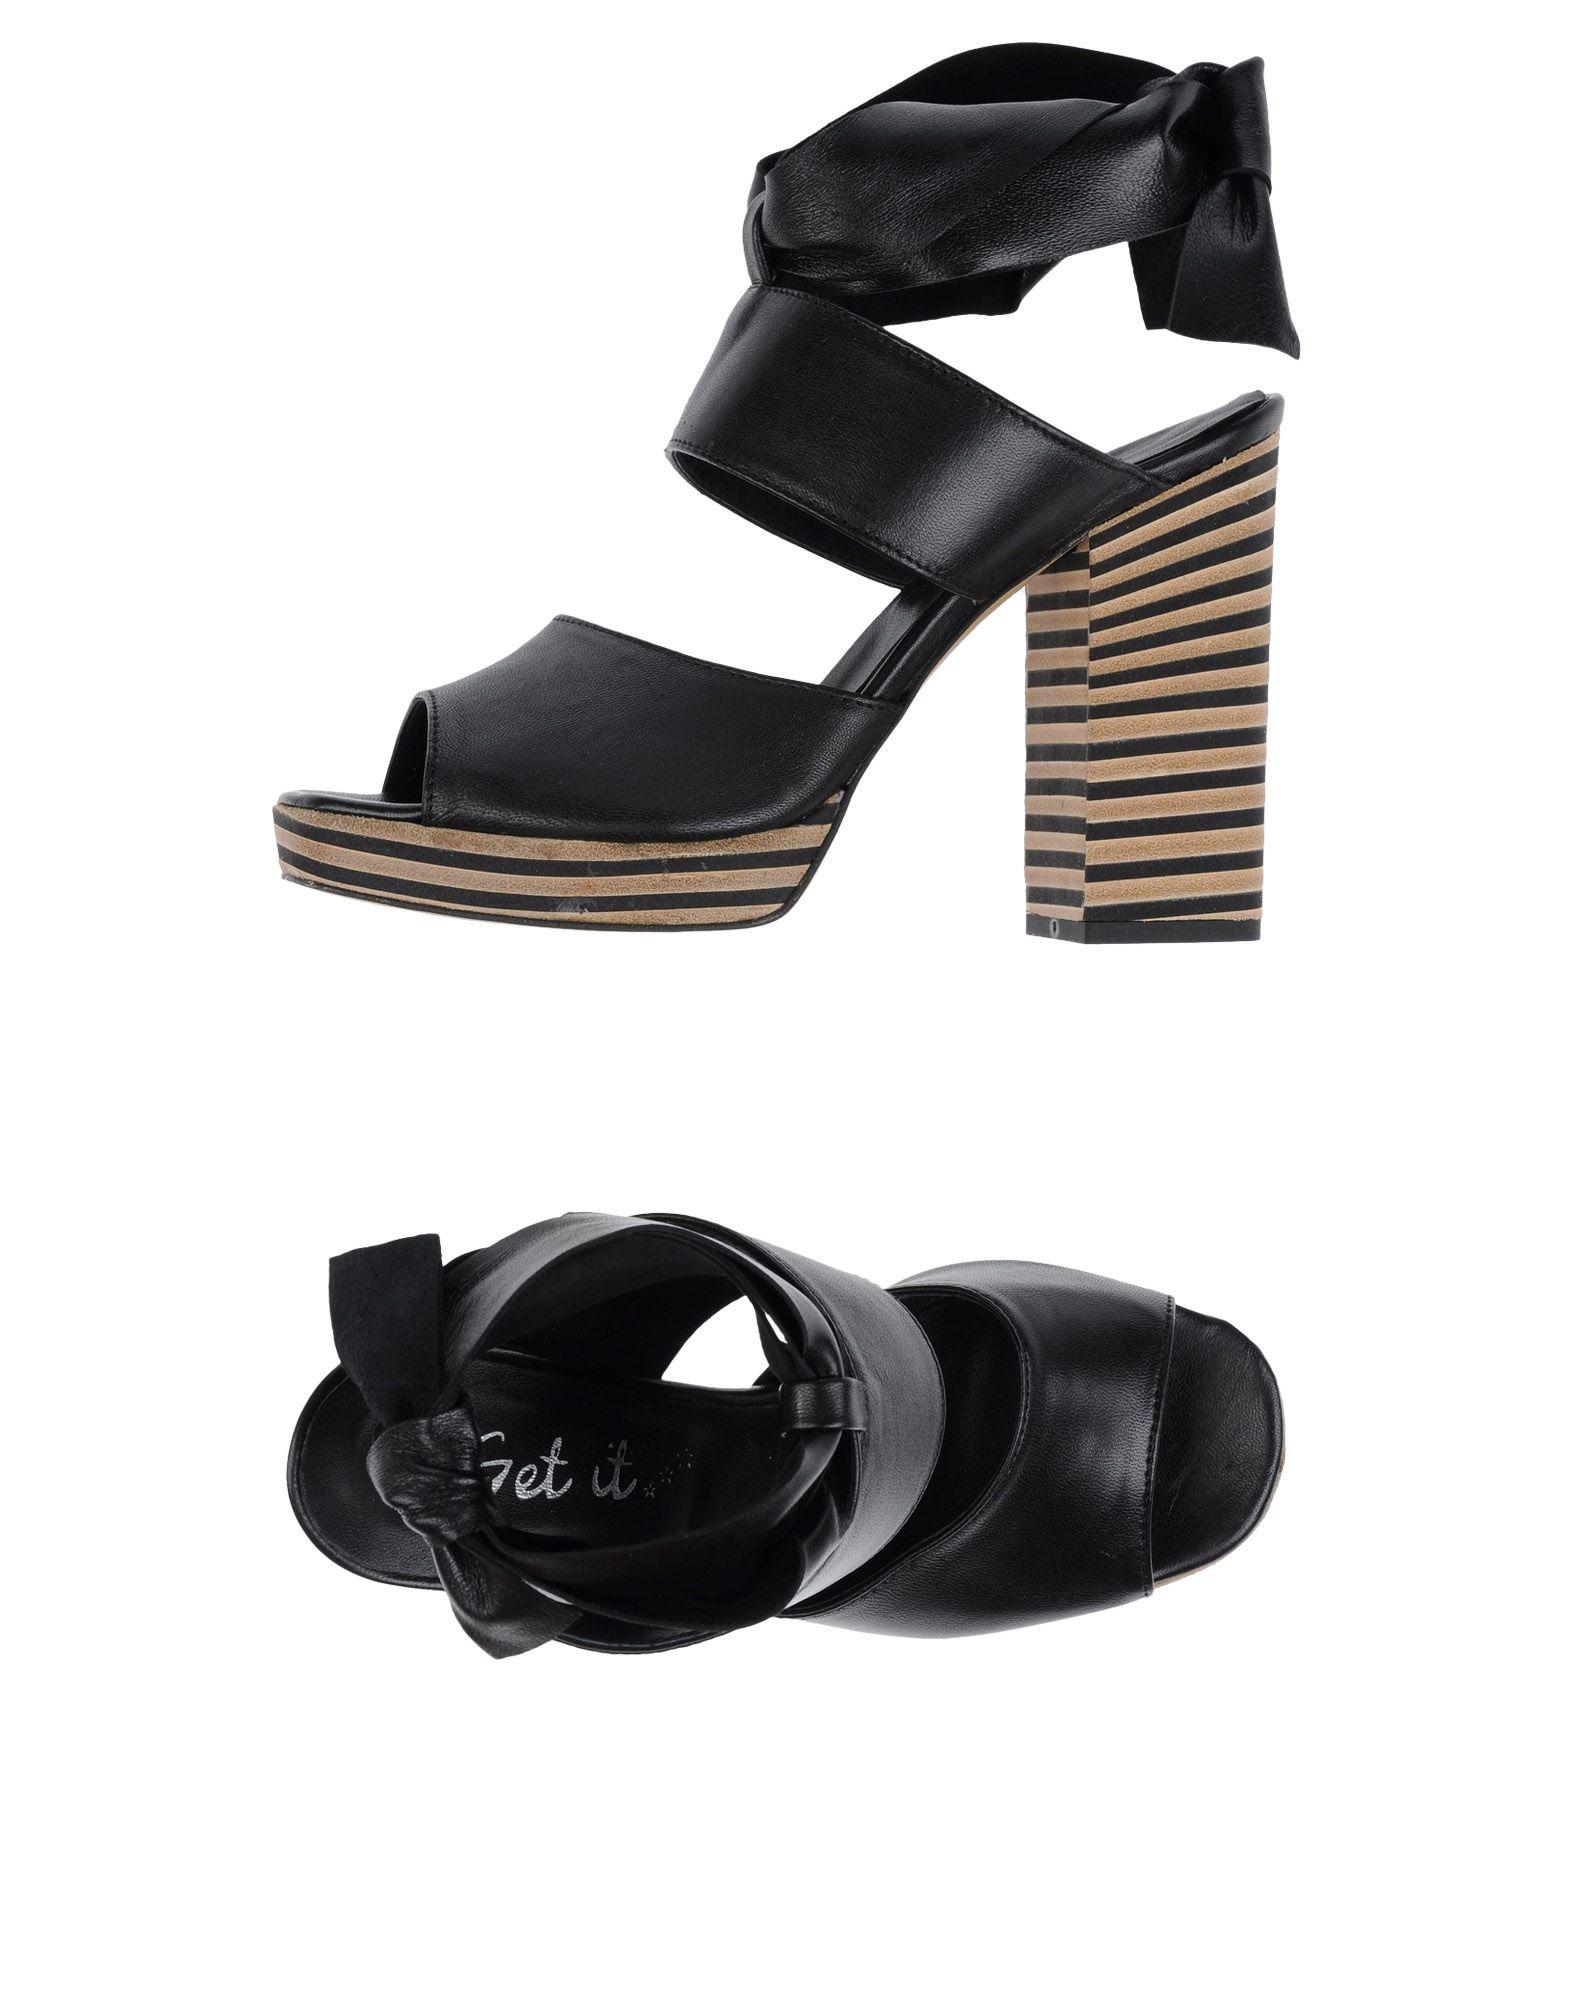 Descuento de la Sandalia marca Sandalia la Get It Mujer - Sandalias Get It  Negro a4cbb5